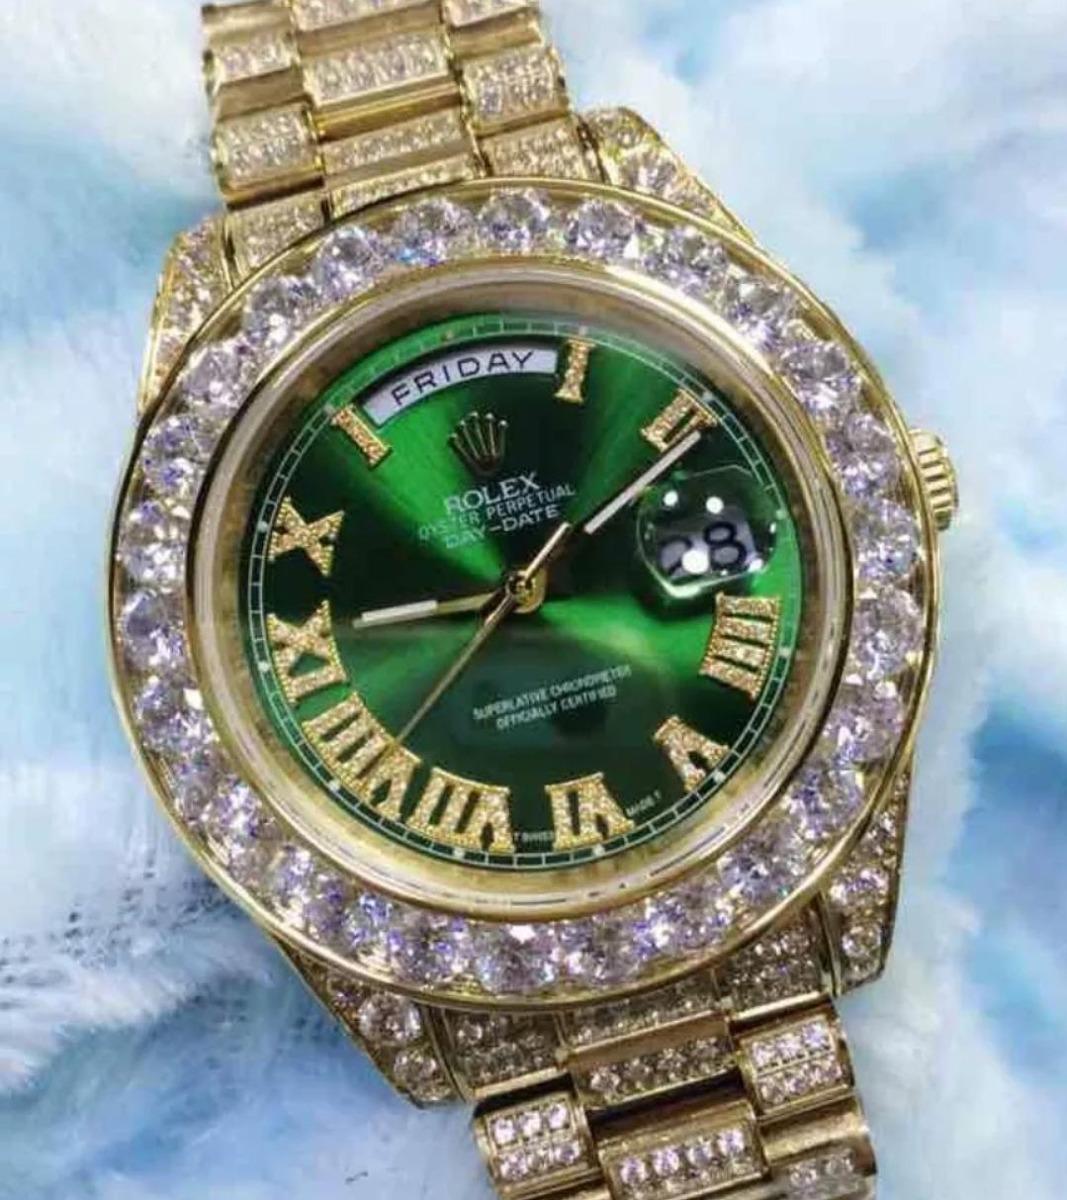 68381456d78 relogio de luxo cravejado rolex brilhante fundo verde 18k. Carregando zoom.